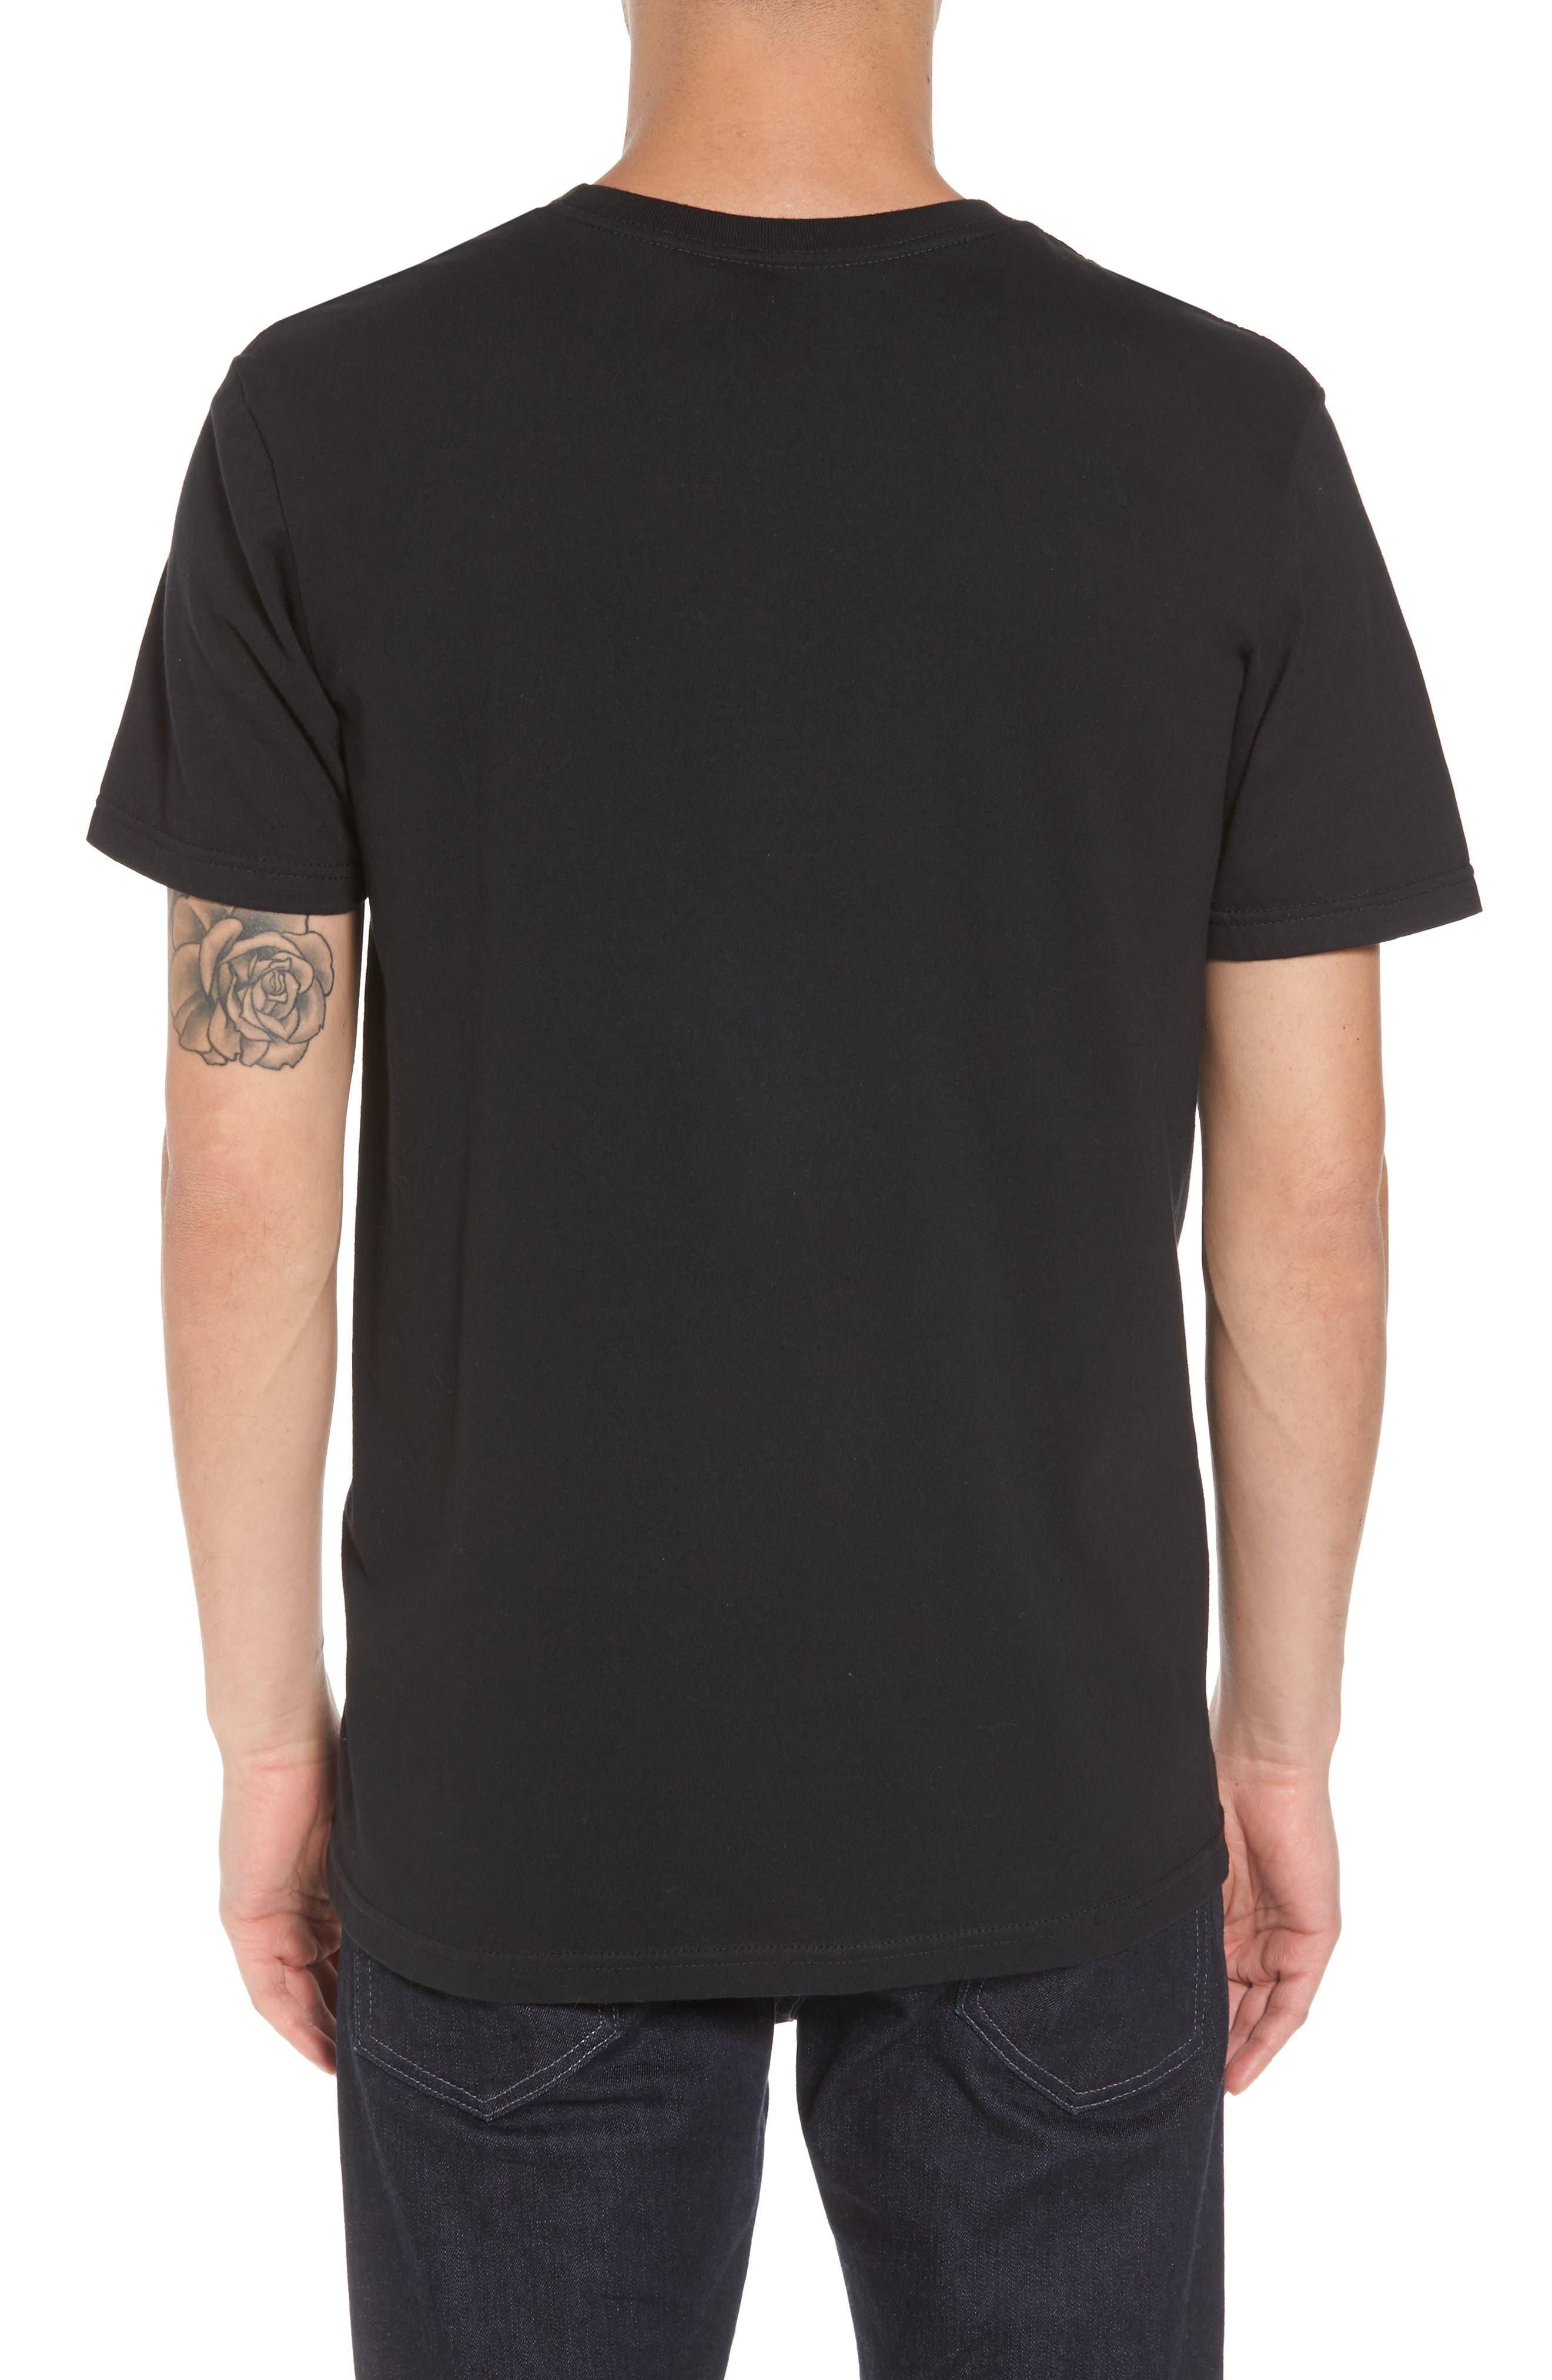 Balance Reflect T-Shirt,                             Alternate thumbnail 2, color,                             001